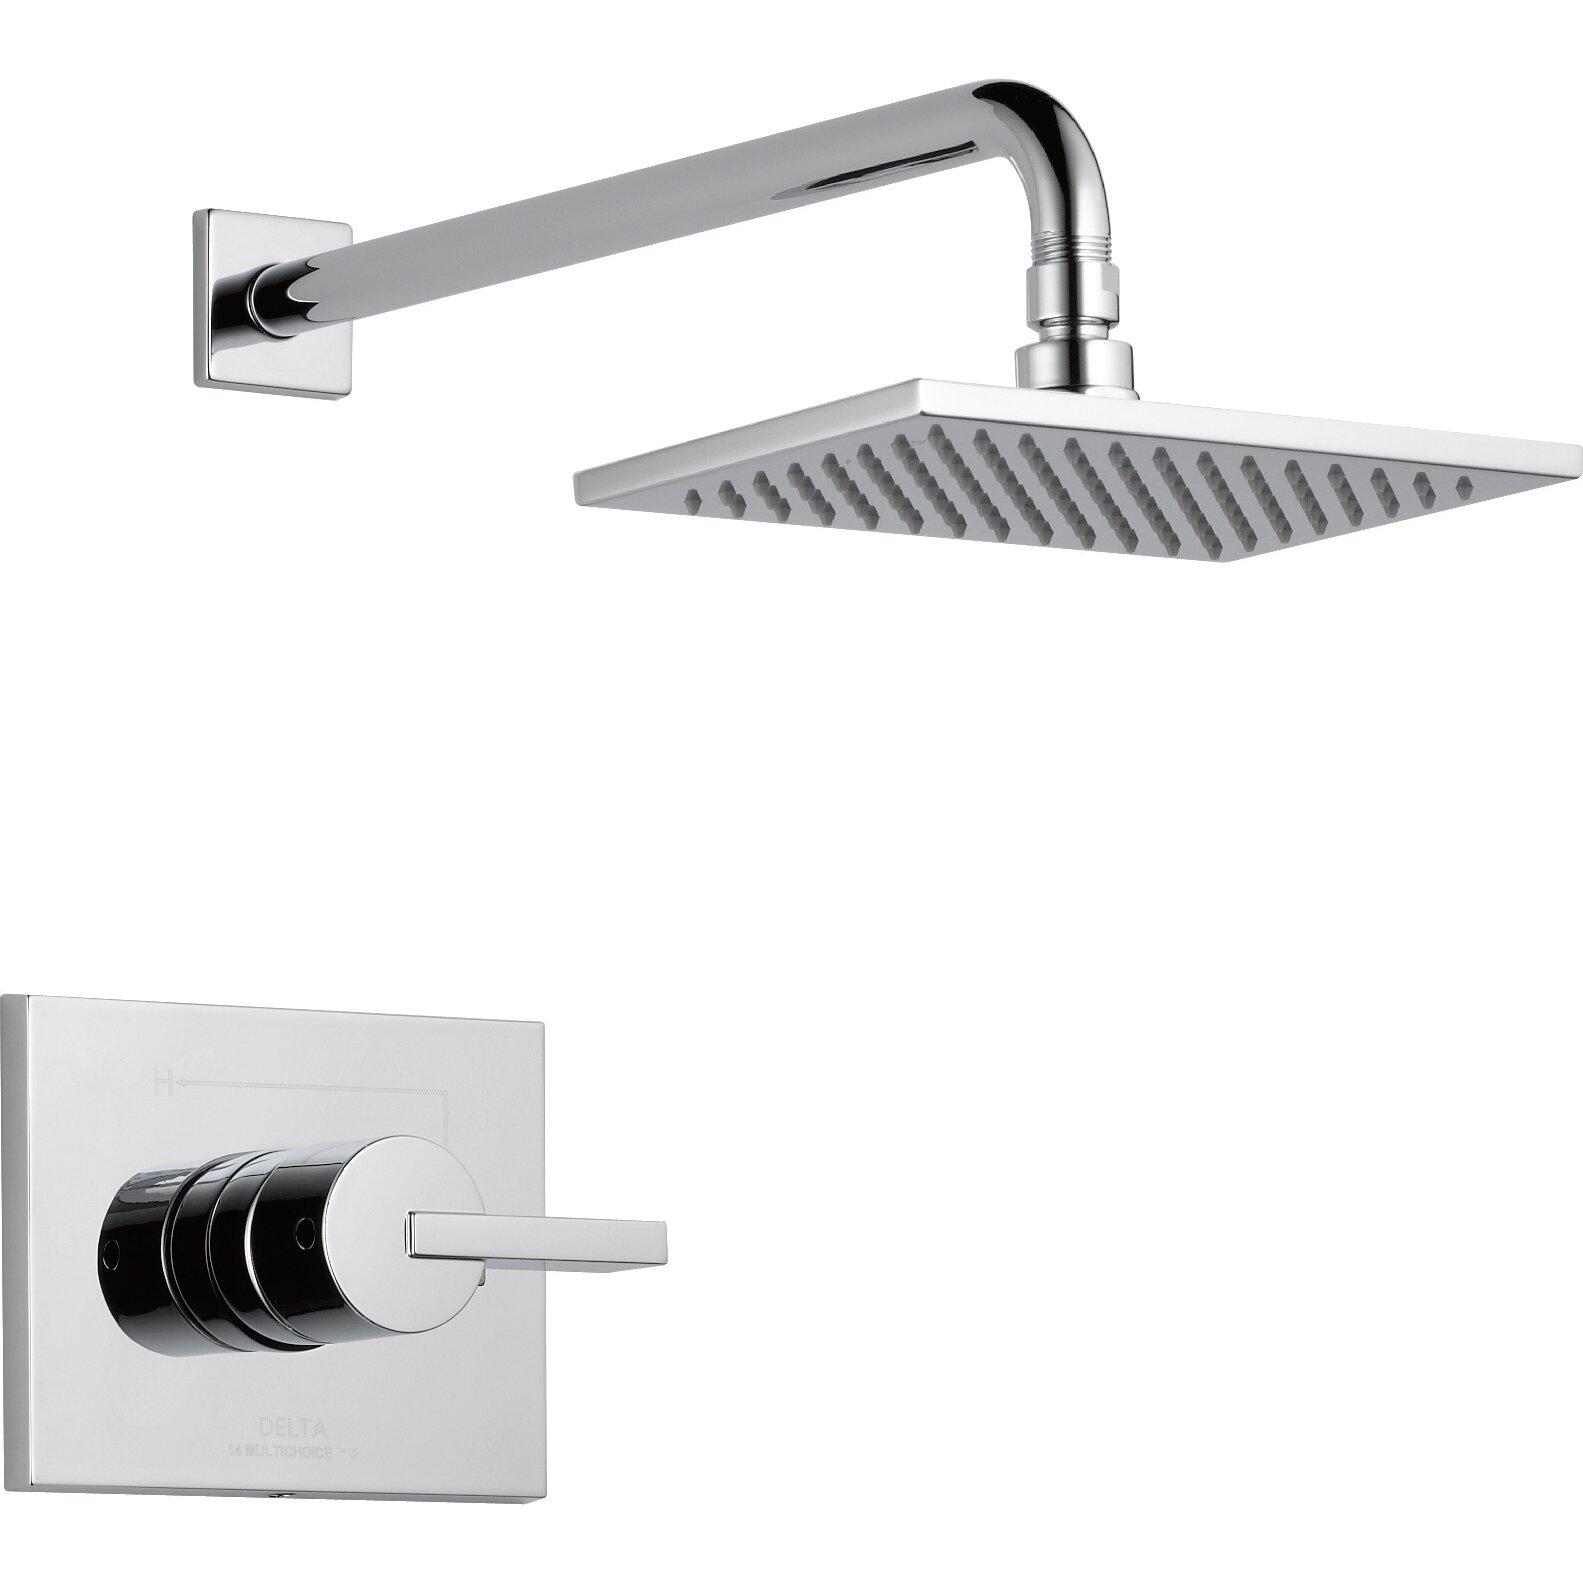 Delta Vero Diverter Shower Faucet. Delta Bath Faucet With Diverter  tub faucet diverter repair